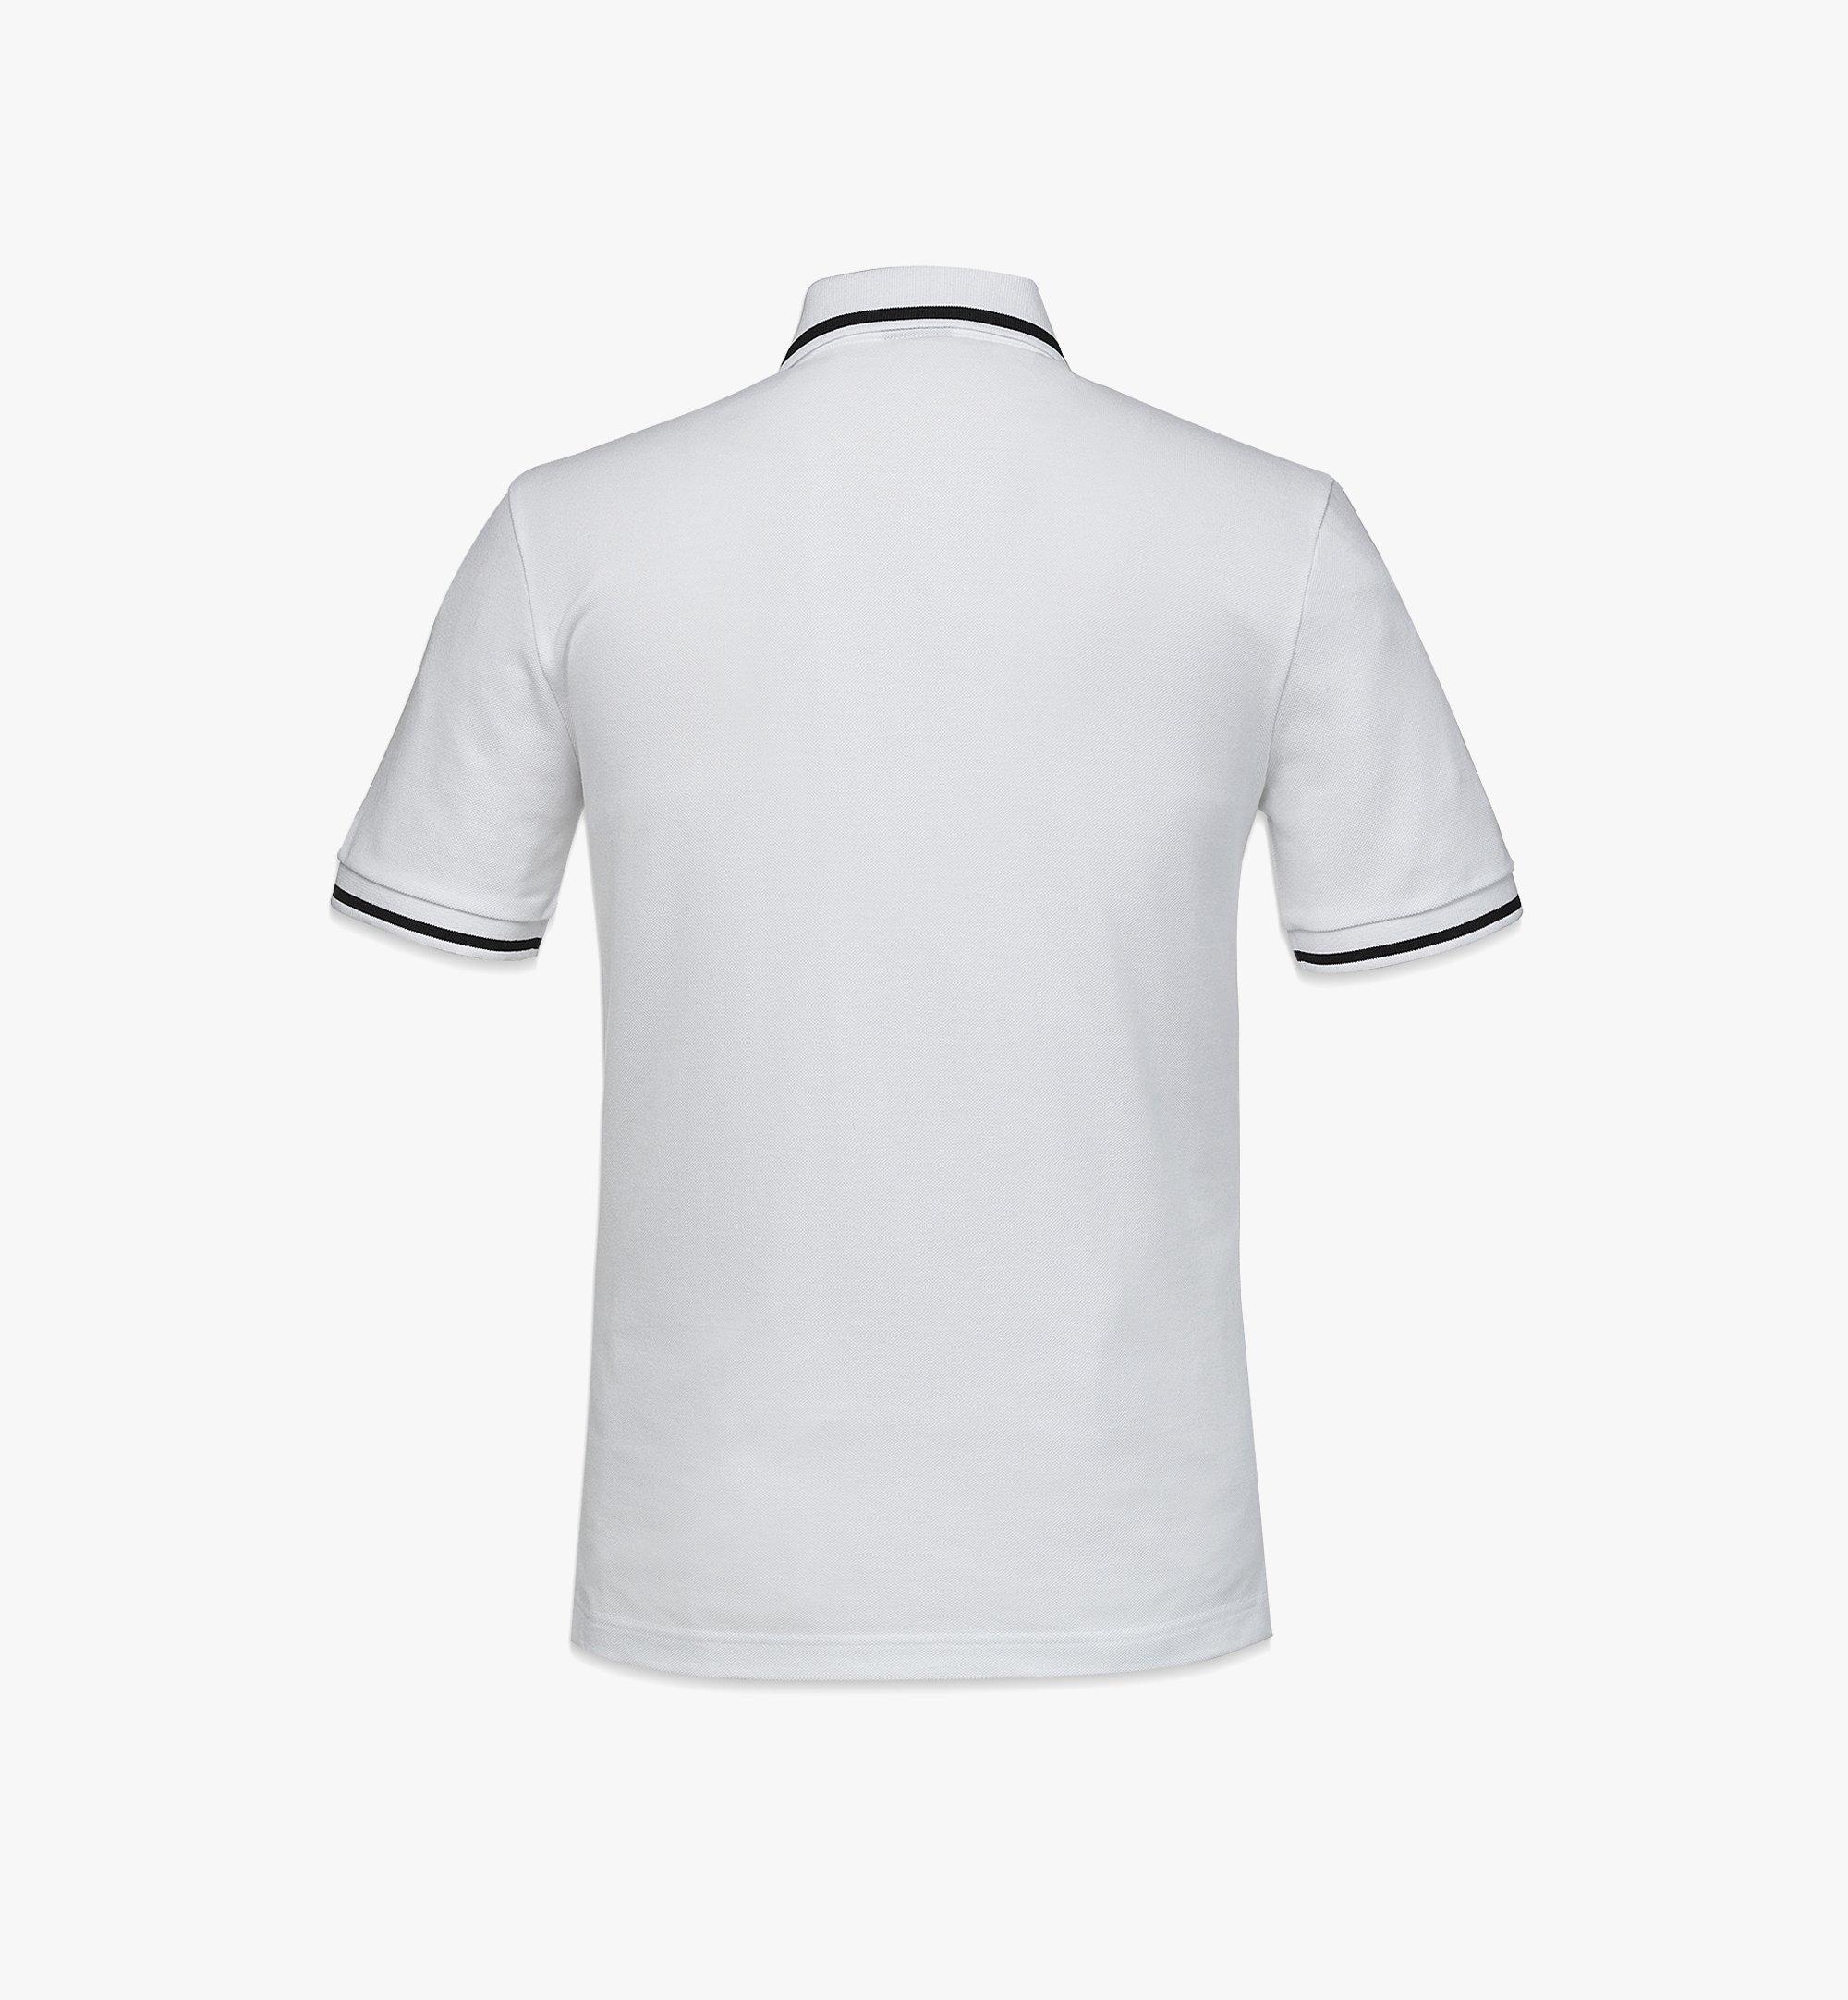 MCM เสื้อโปโล MCM x SAMBYPEN สำหรับผู้ชาย White MHTBASP01WT00L มุมมองอื่น 1